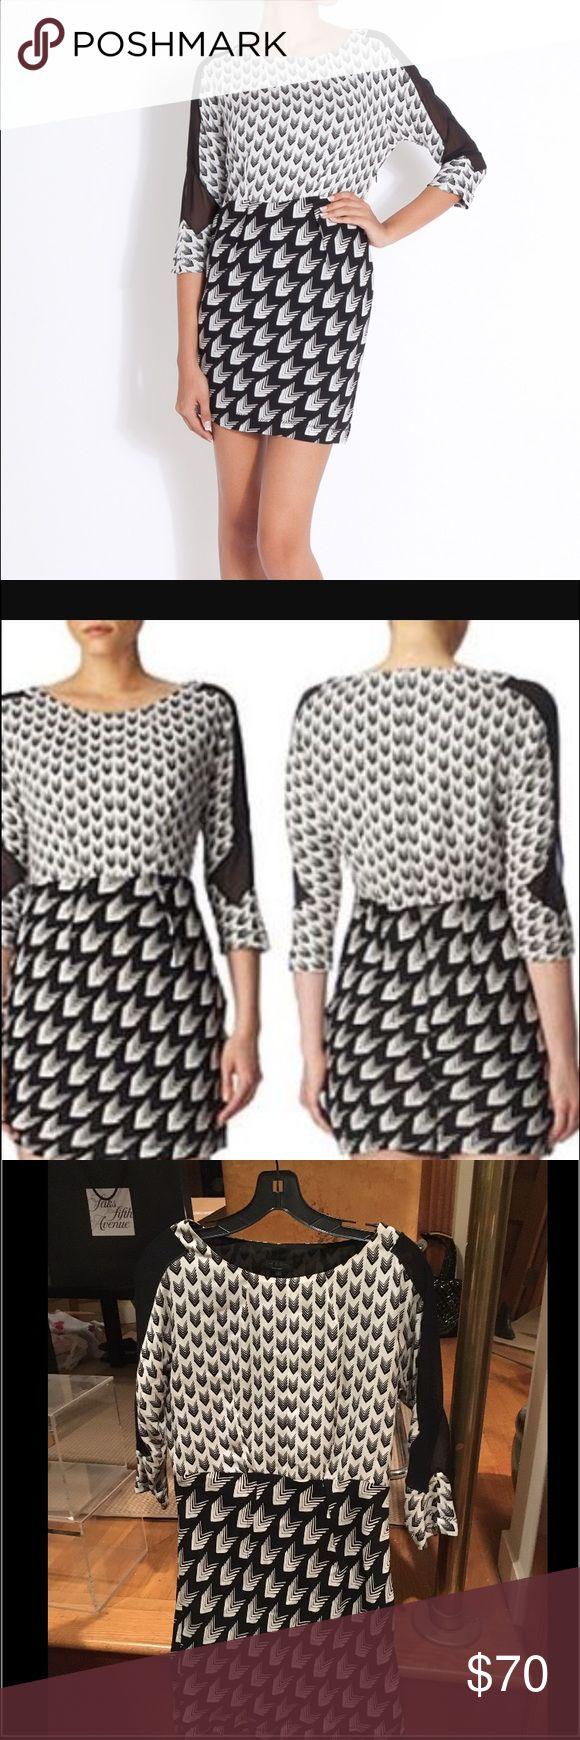 Chevron print rag & bone dress, S Black and white multi chevron print rag and bone dress with sheer sleeve detail. Amazing print. Dress is silk. Size S. in great condition! rag & bone Dresses